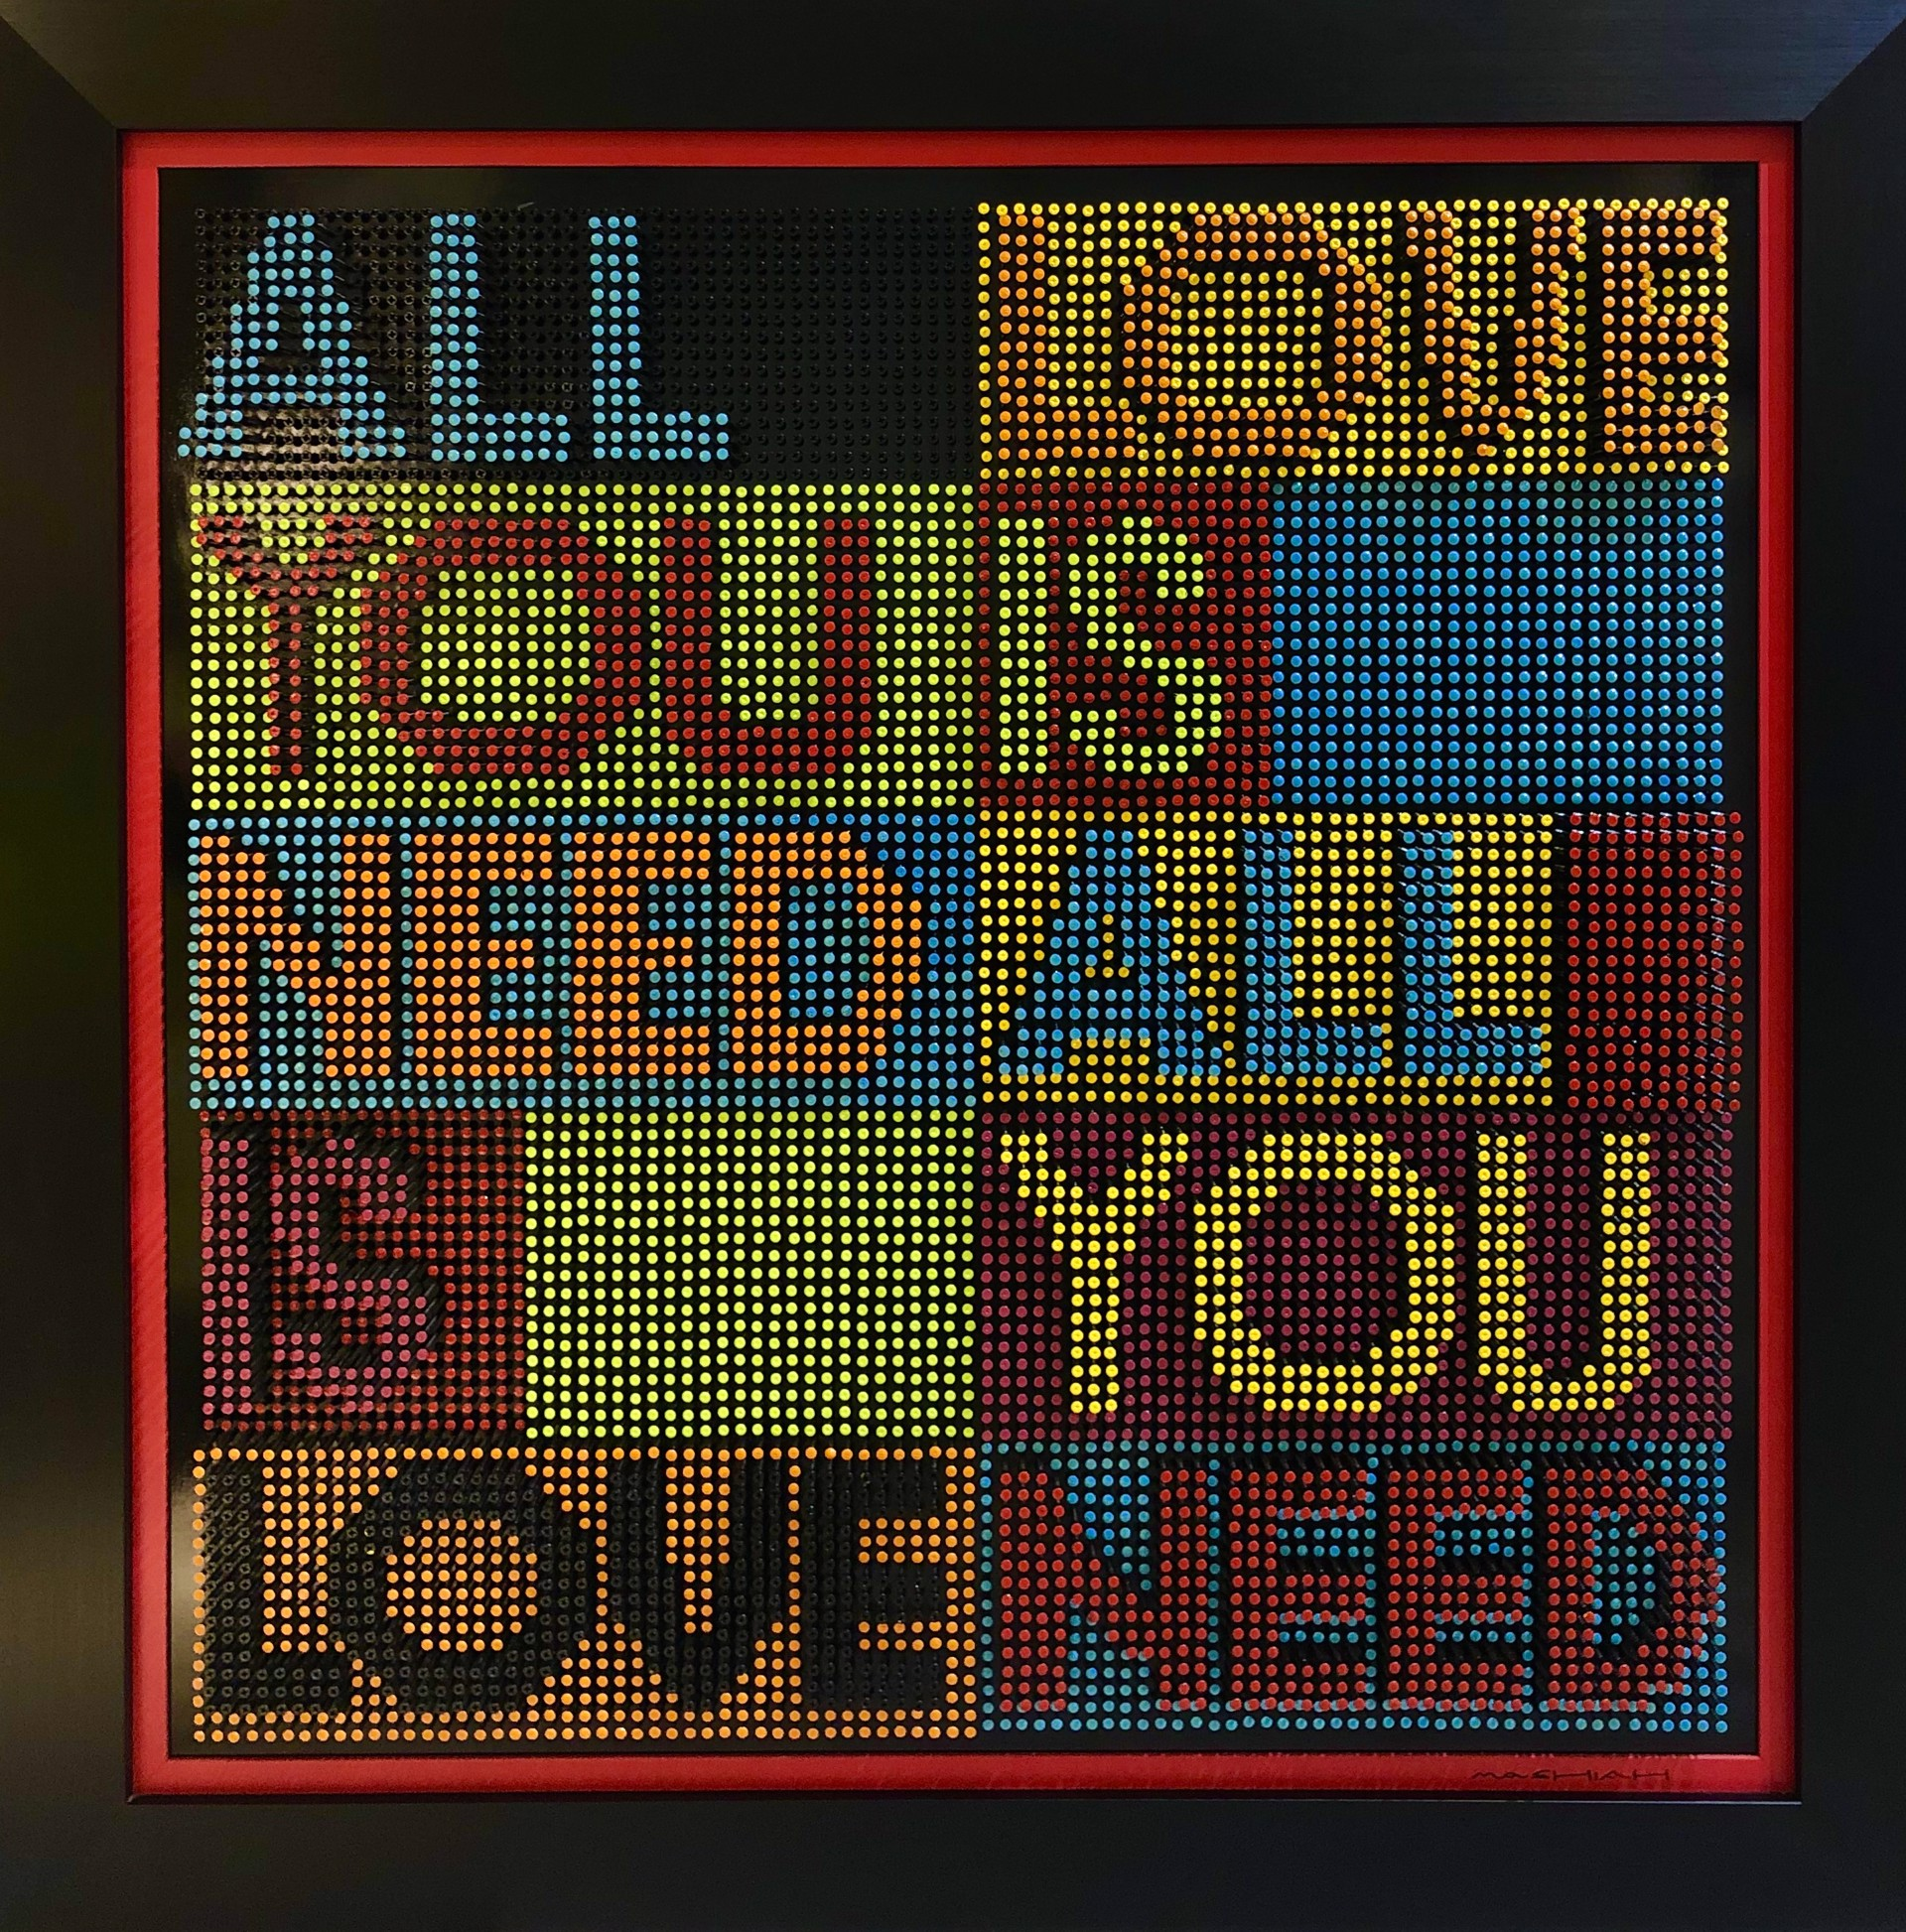 ALL YOU NEED IS LOVE by Efi Mashiah